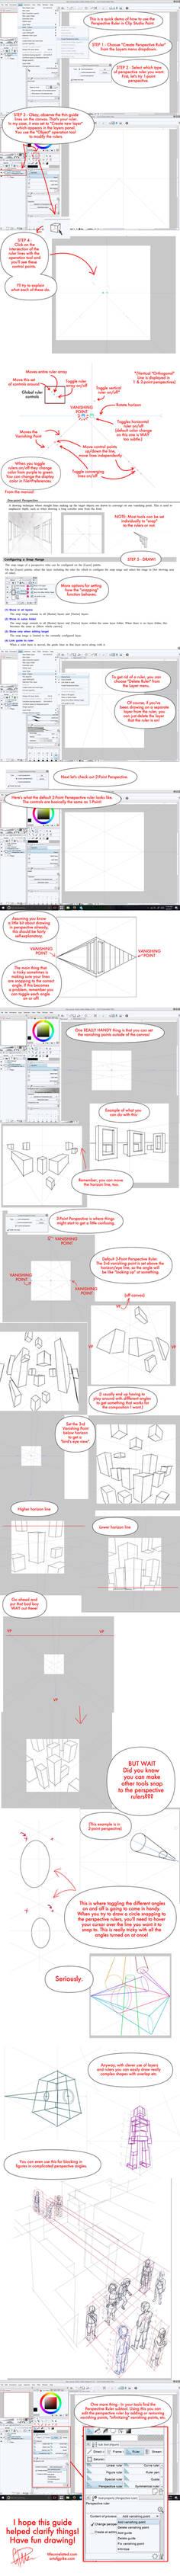 Clip Studio Paint Perspective Ruler Tutorial!